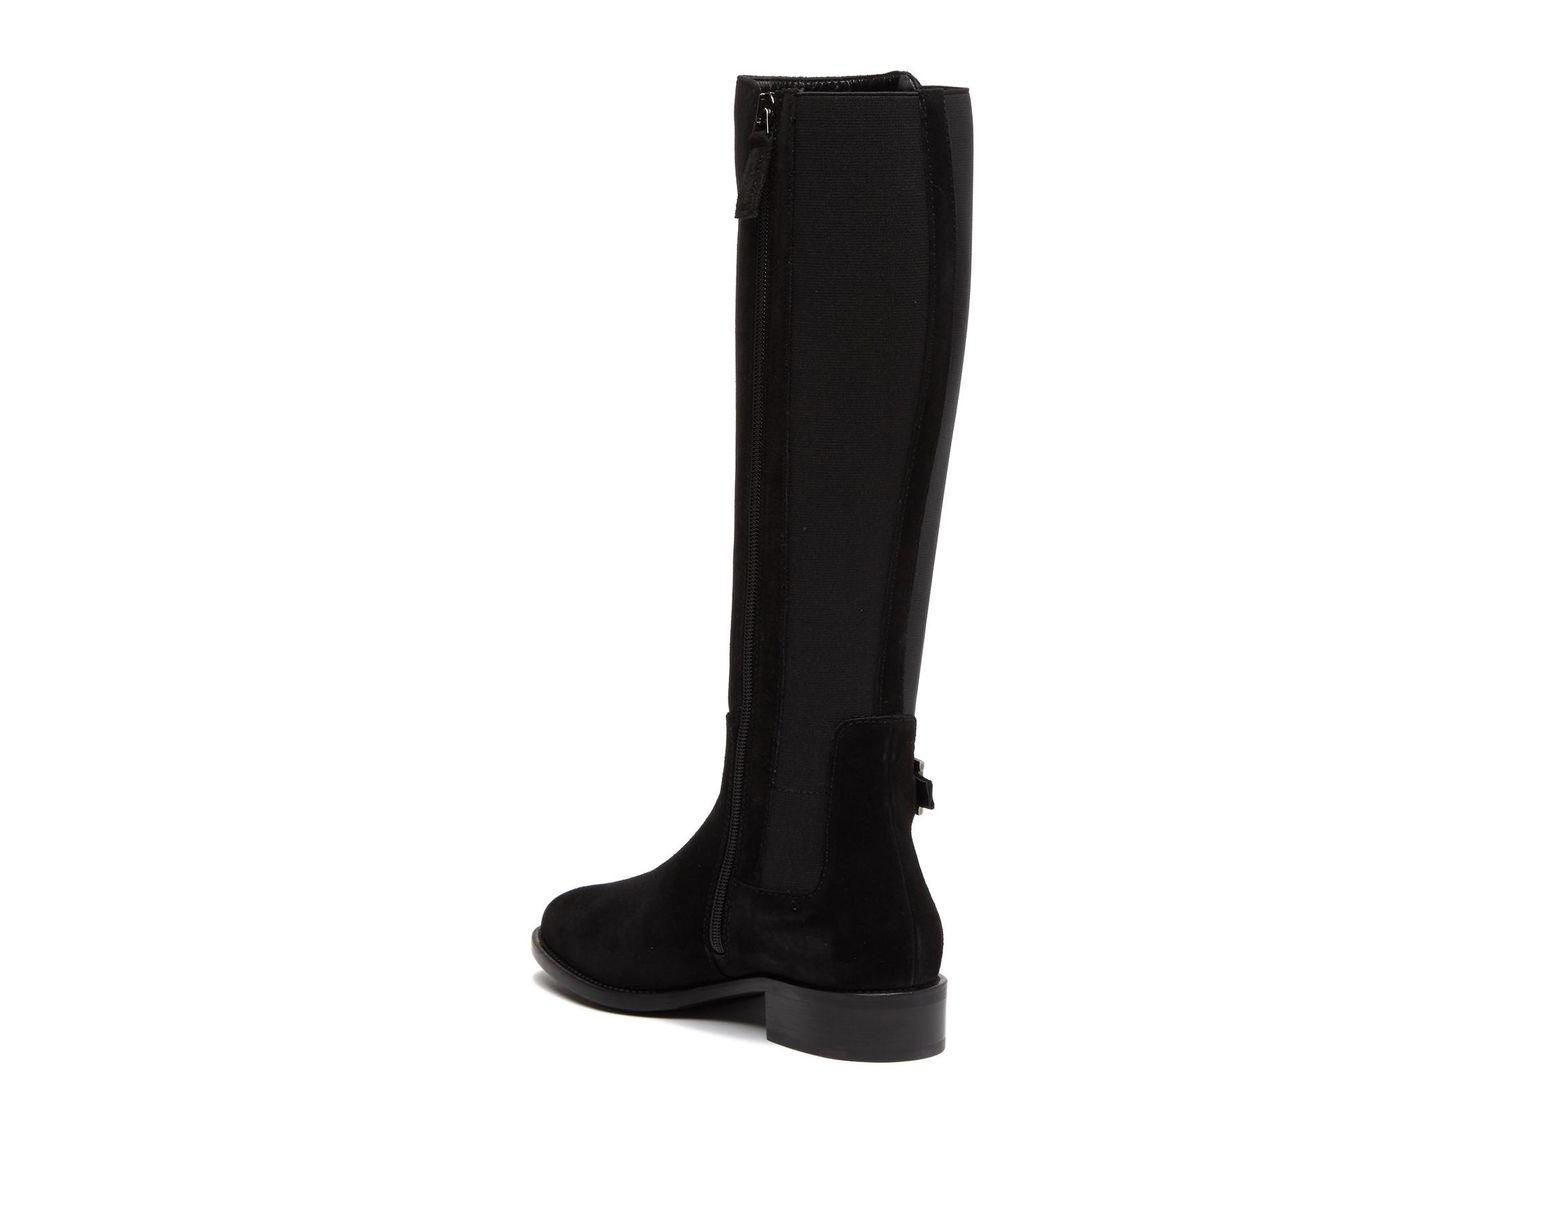 839b8656 Women's Black Natalee Waterproof Suede Riding Boot